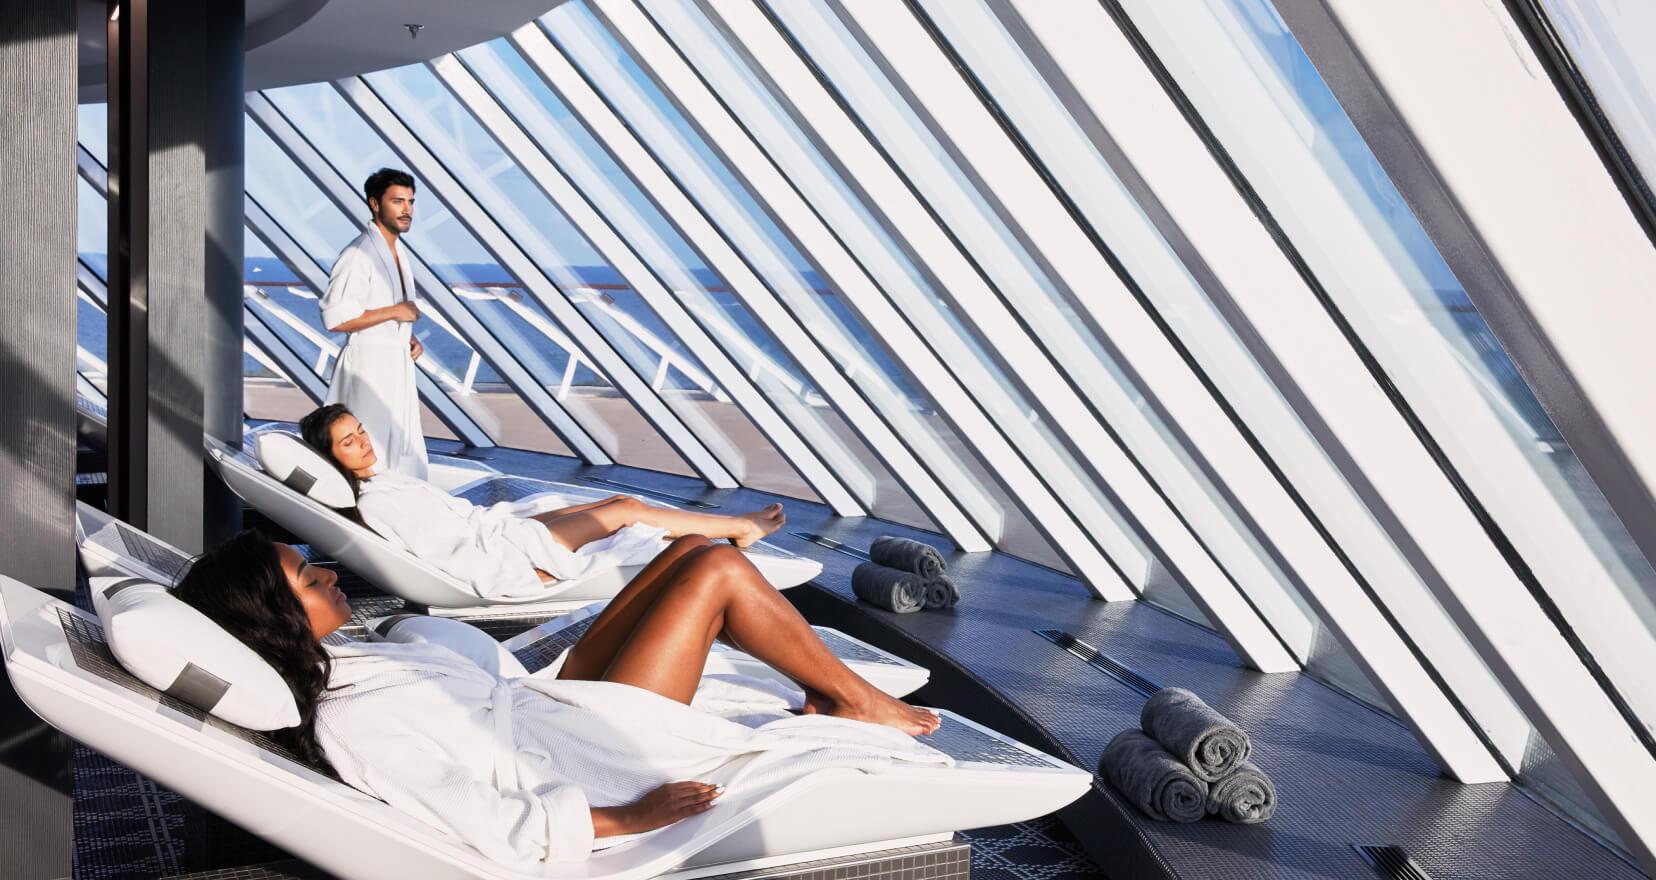 people sunbathing on a cruise ship